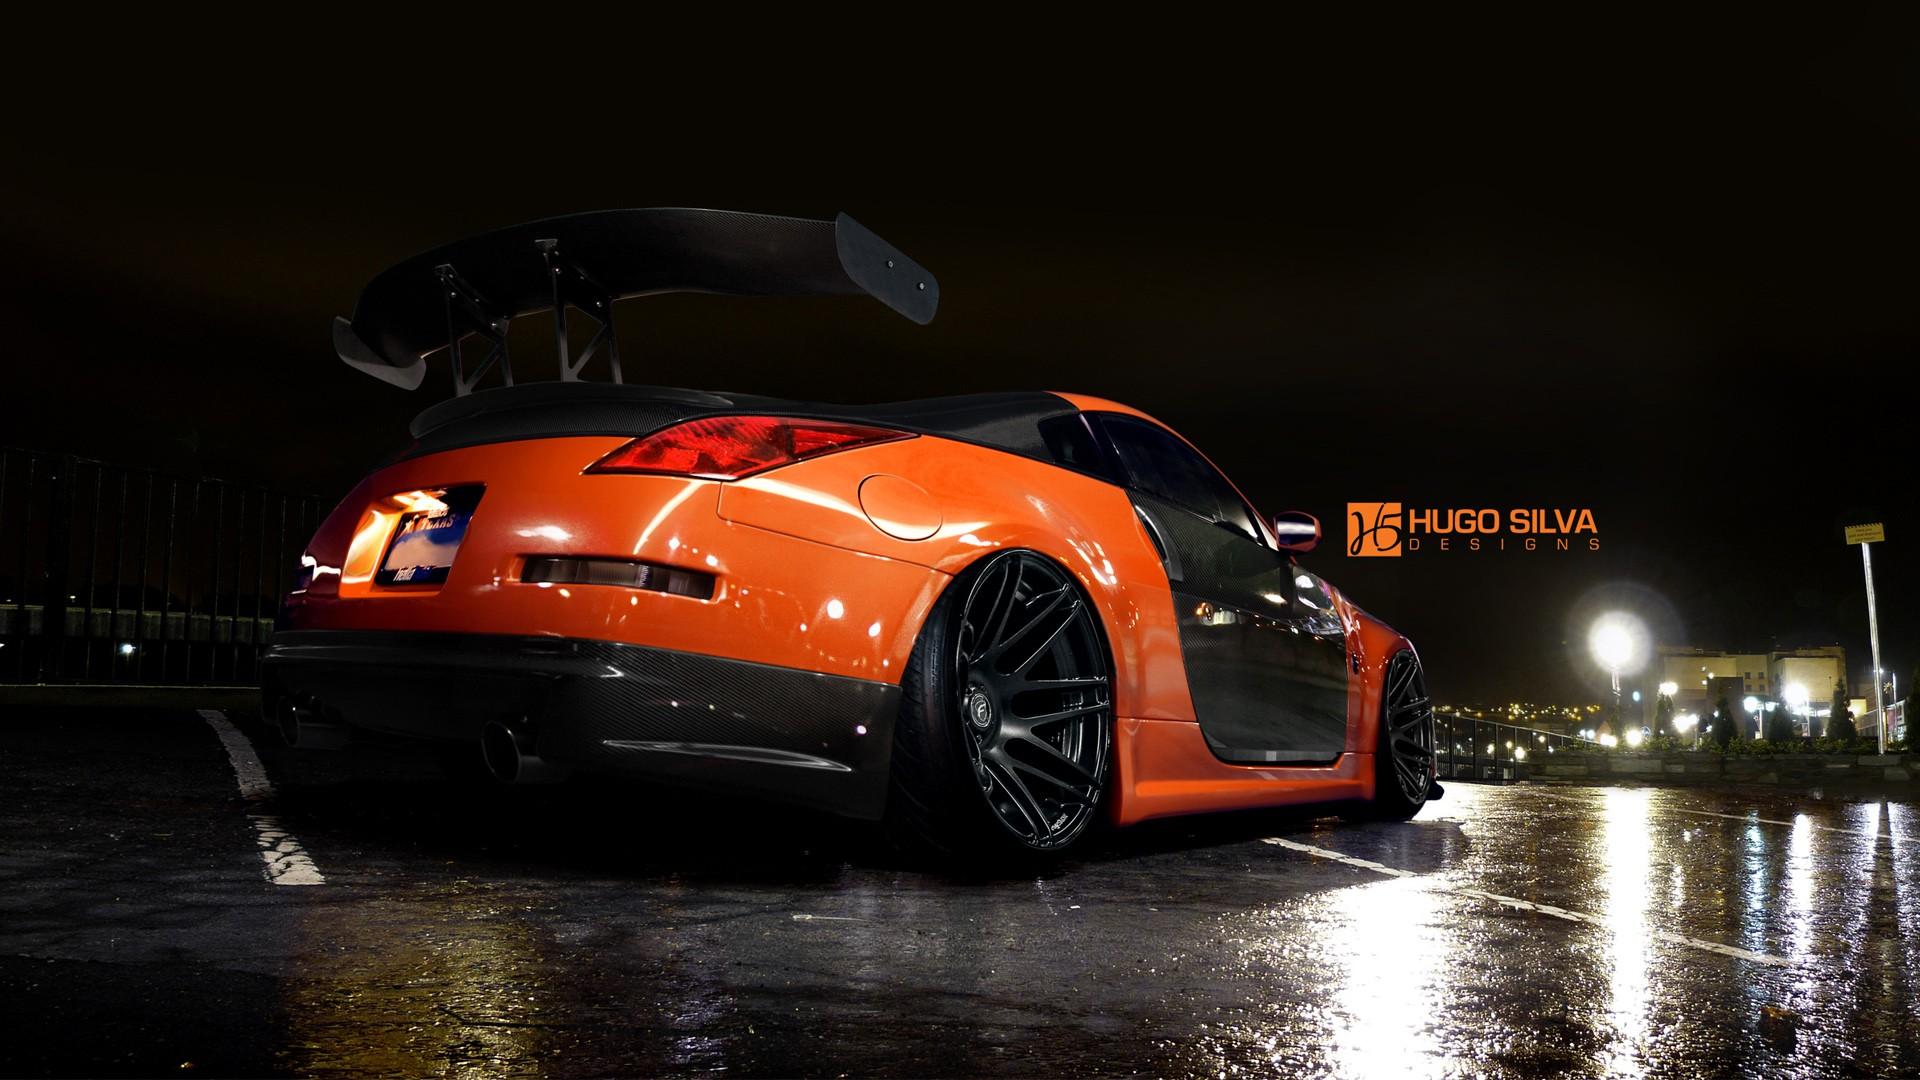 Toyota Of Orange >> Orange Nissan 350z Wallpaper   HD Car Wallpapers   ID #4915